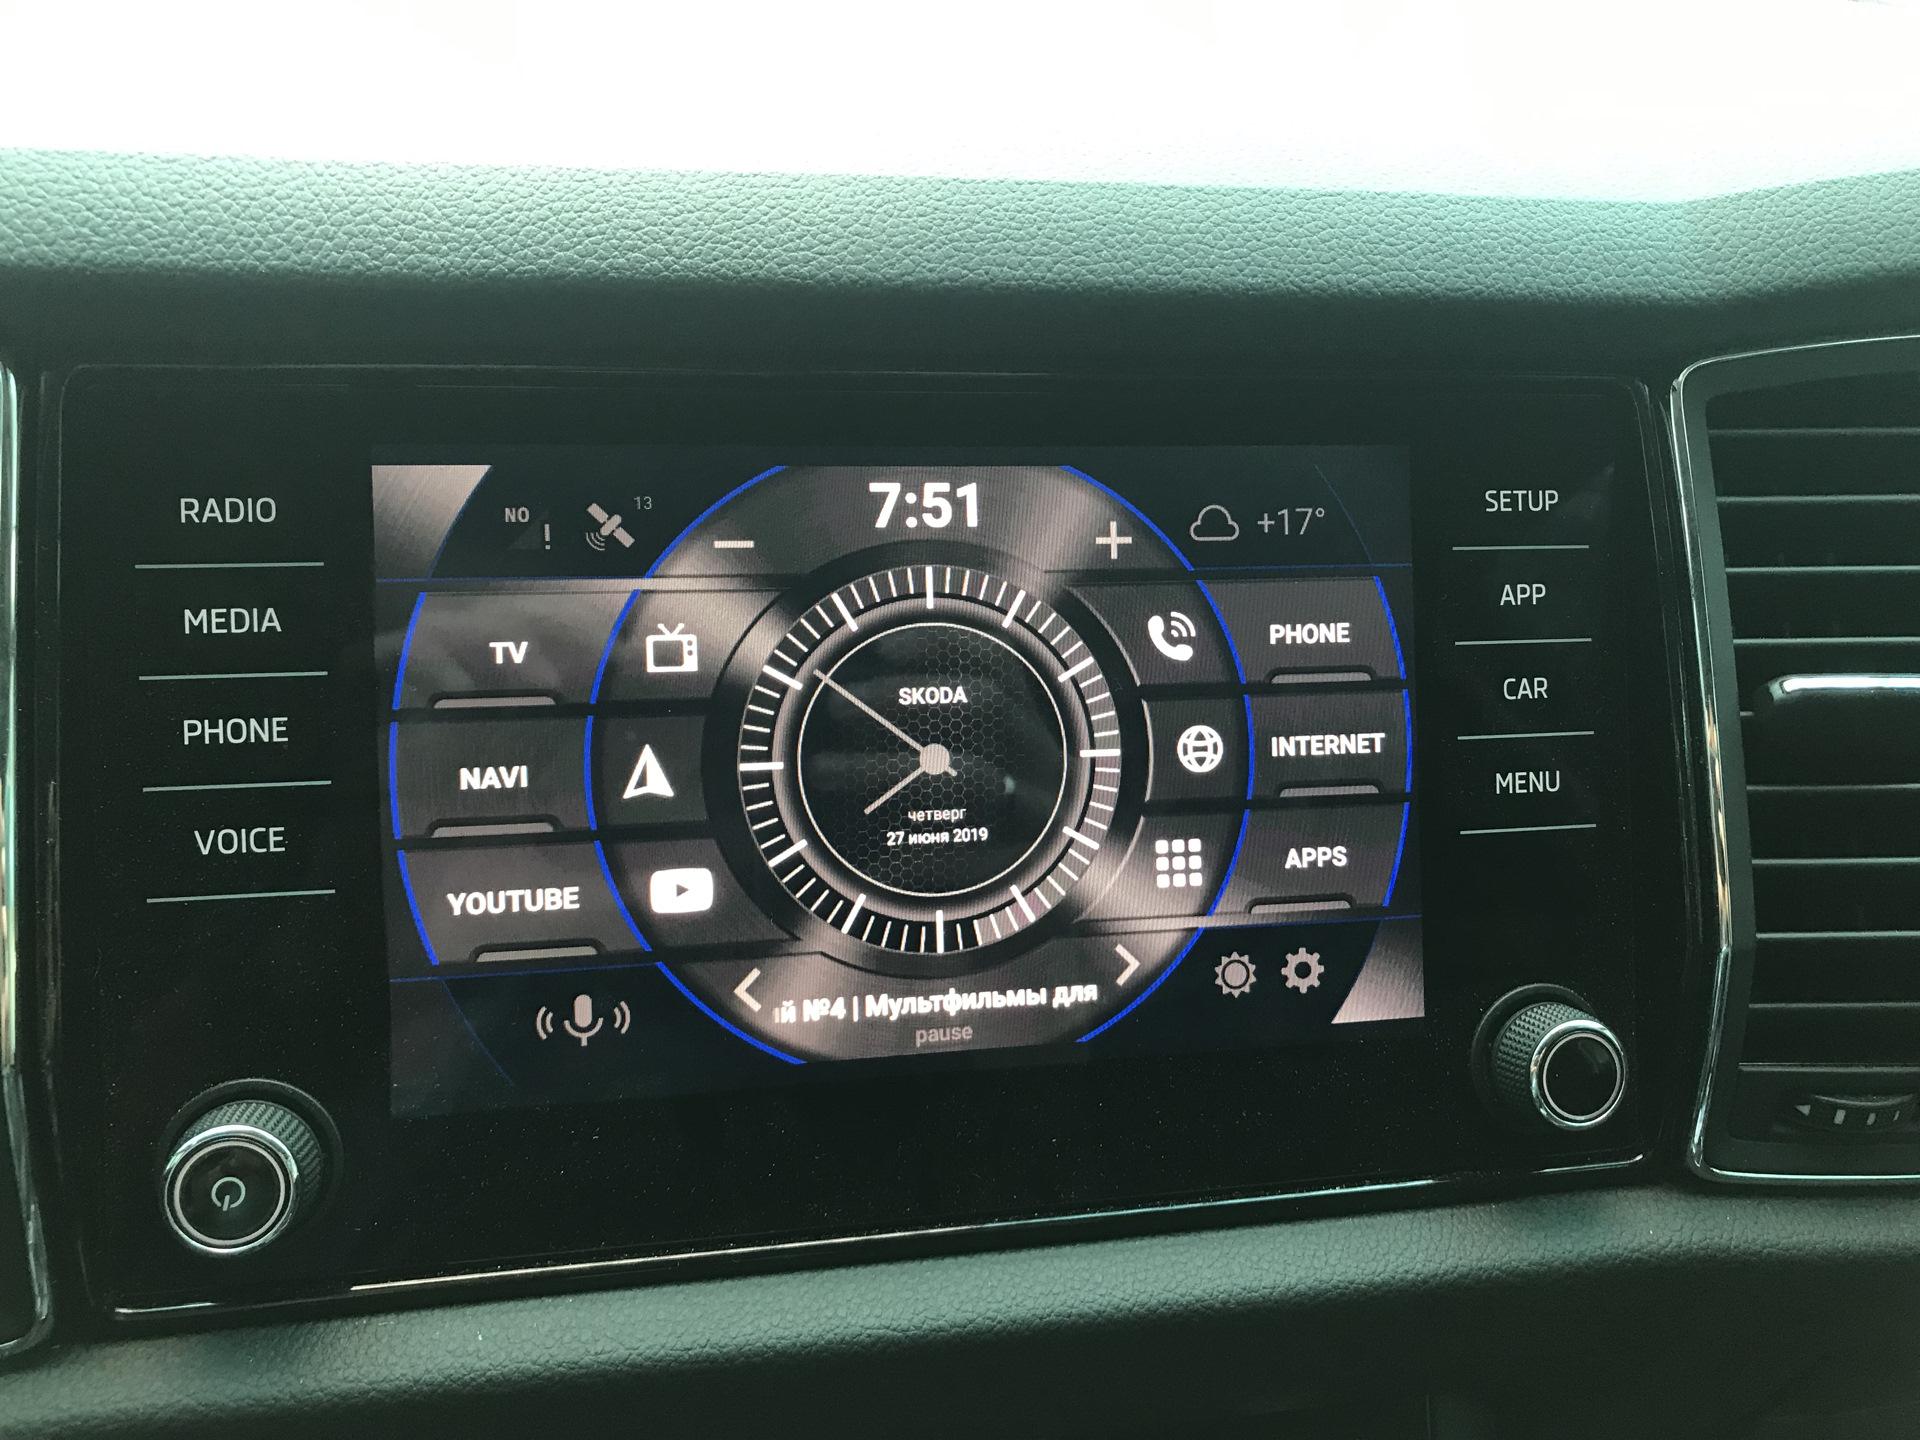 Balero + Sony Xperia Z3 compact + Mirrorlink + AGAMA Car